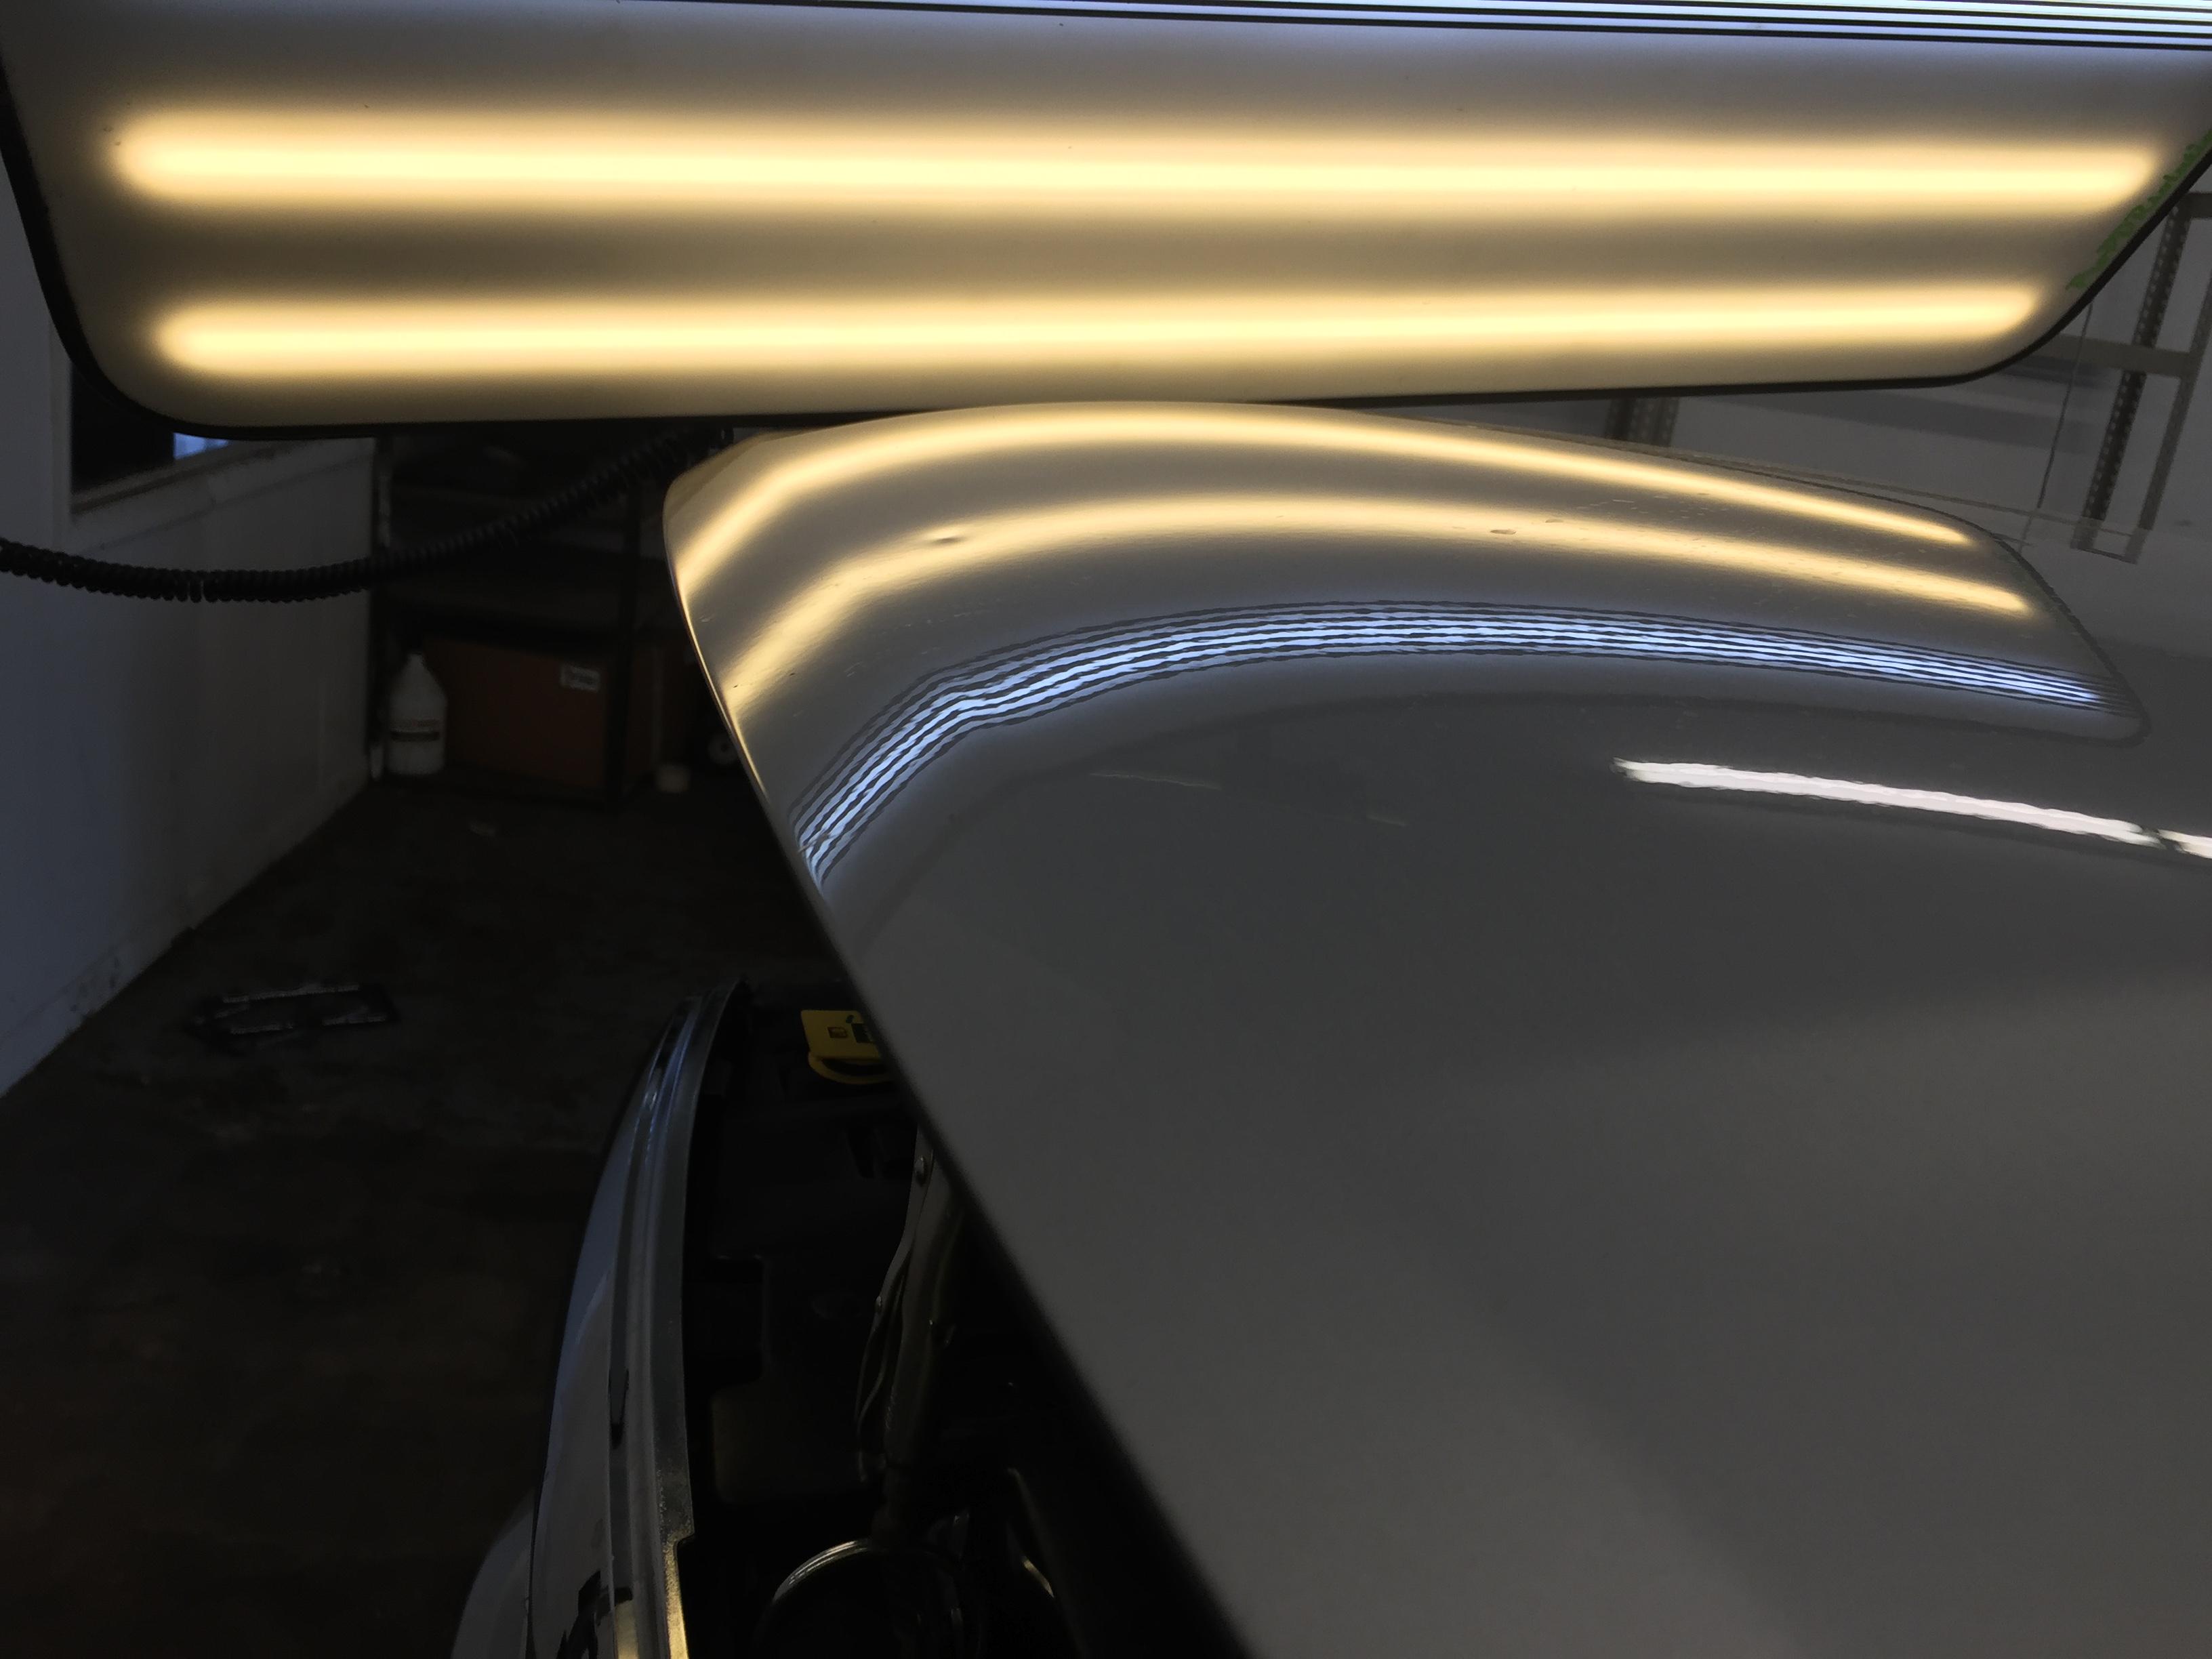 2015 Dodge Ram hail damage on hood, paintless dent repair, Springfield, IL. http://217dent.com by Michael Bocek